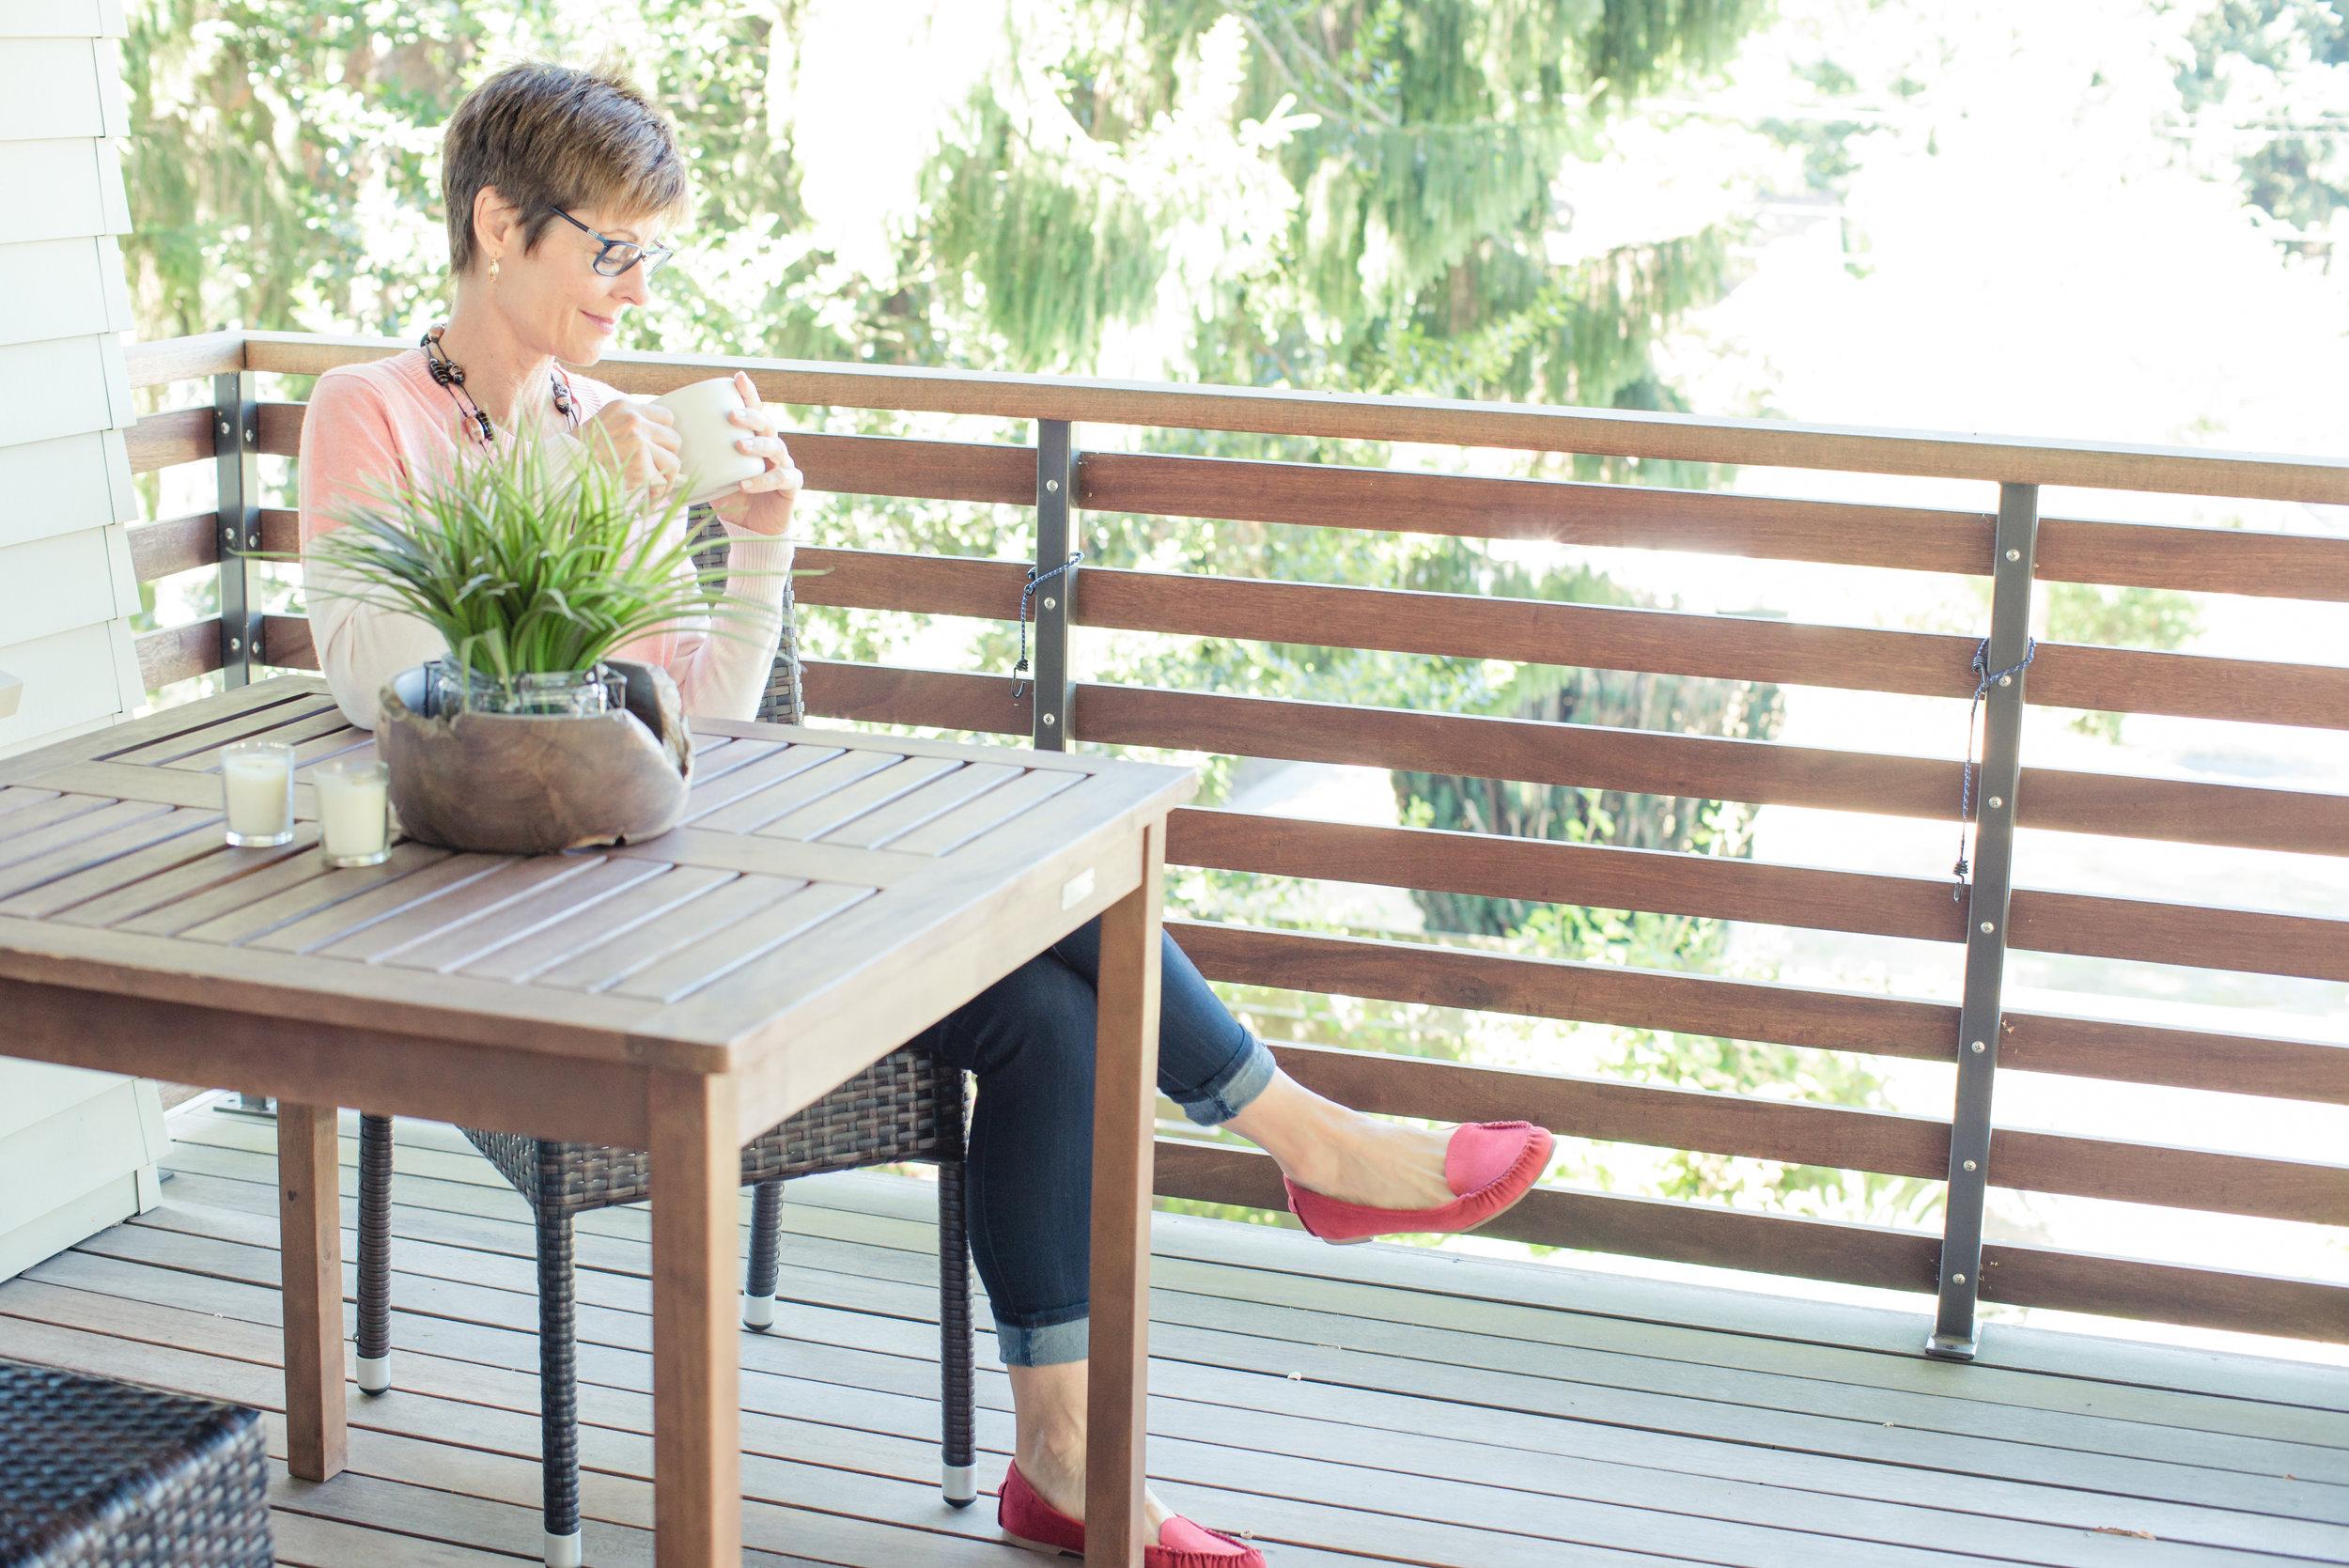 Patty Brockman Real Estate Branding Photos by Brightly & Co. | www.BrightlyandCo.com